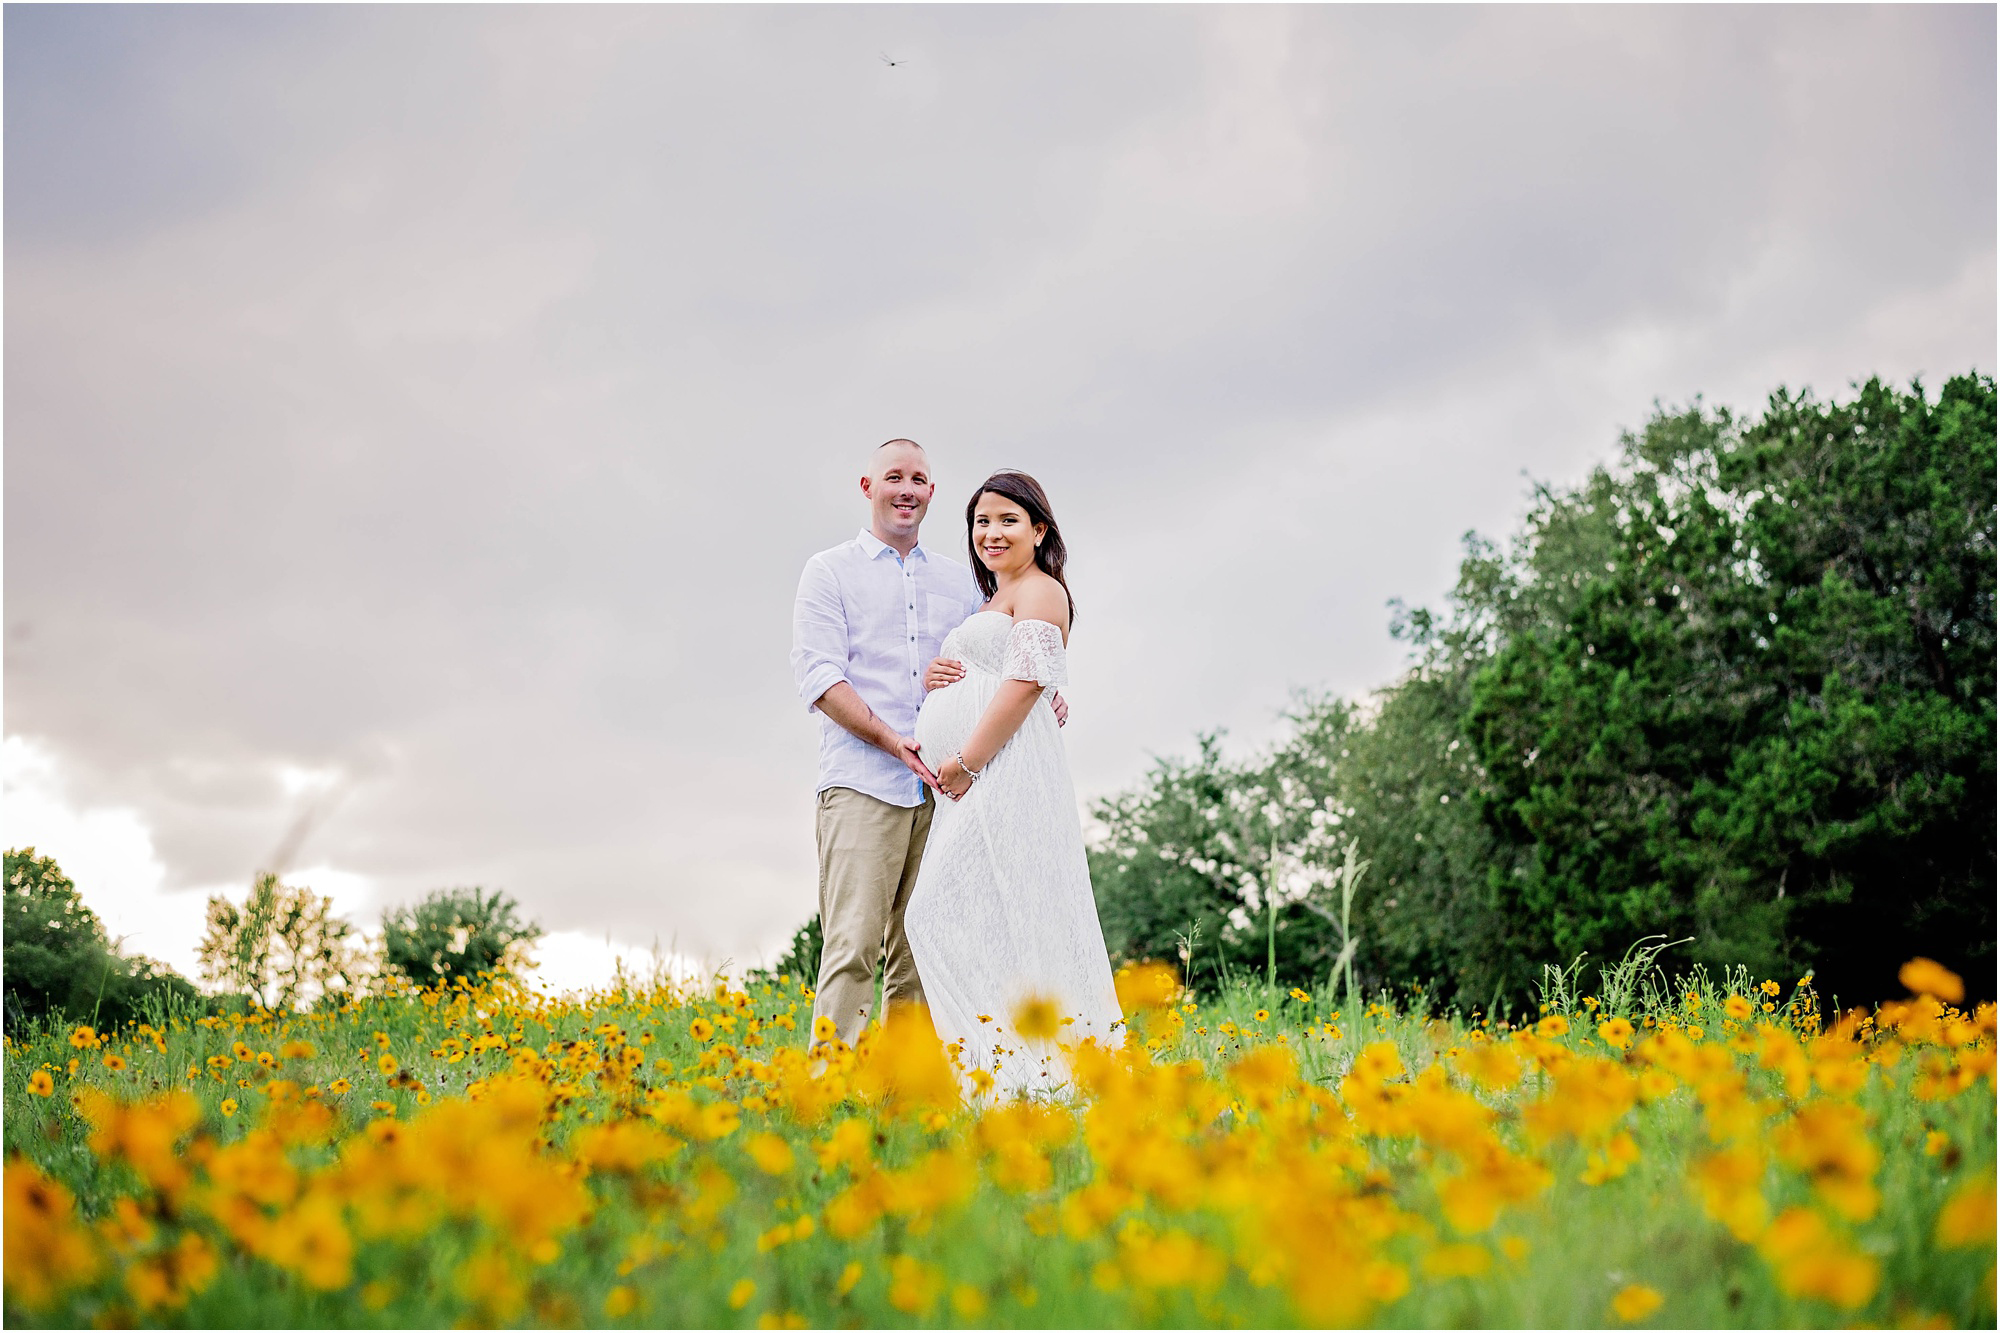 Maternity Photoshoot Of Couple In Beautiful Yellow Flower Field Cedar Park Texas Photographer Maegan Kylie Photography